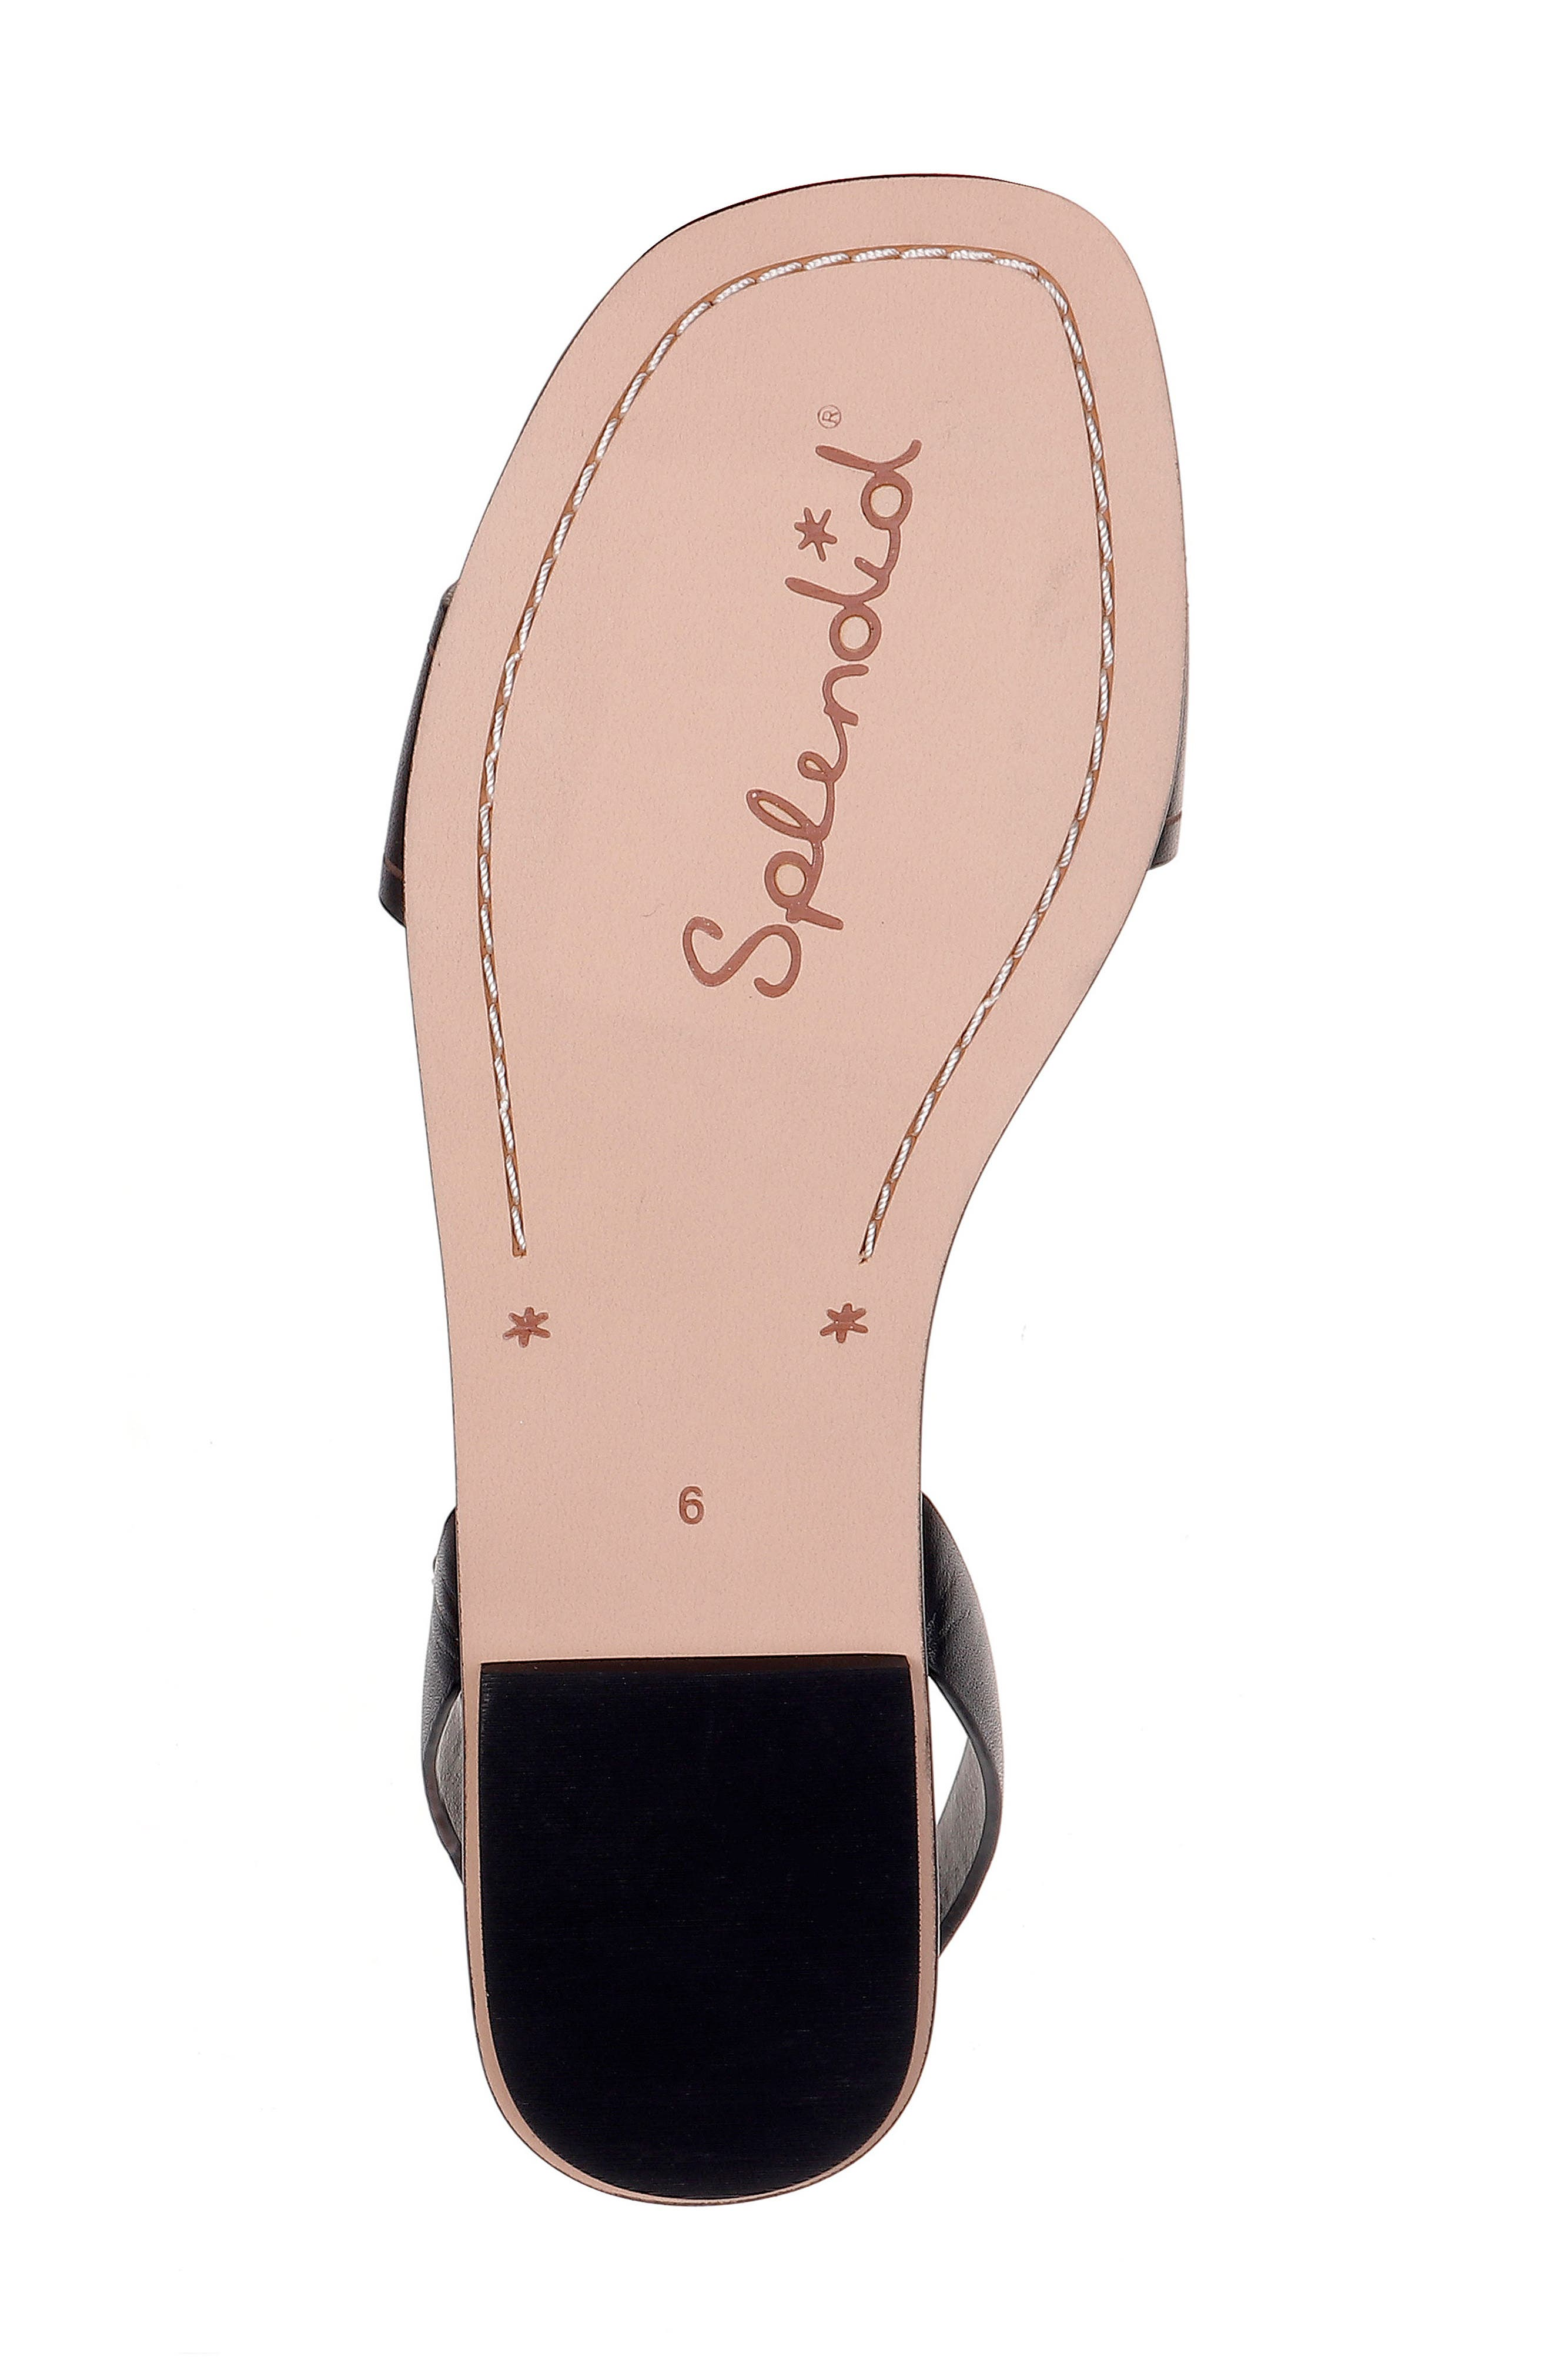 SPLENDID, Tabitha Ankle Strap Flat Sandal, Alternate thumbnail 6, color, BLACK LEATHER